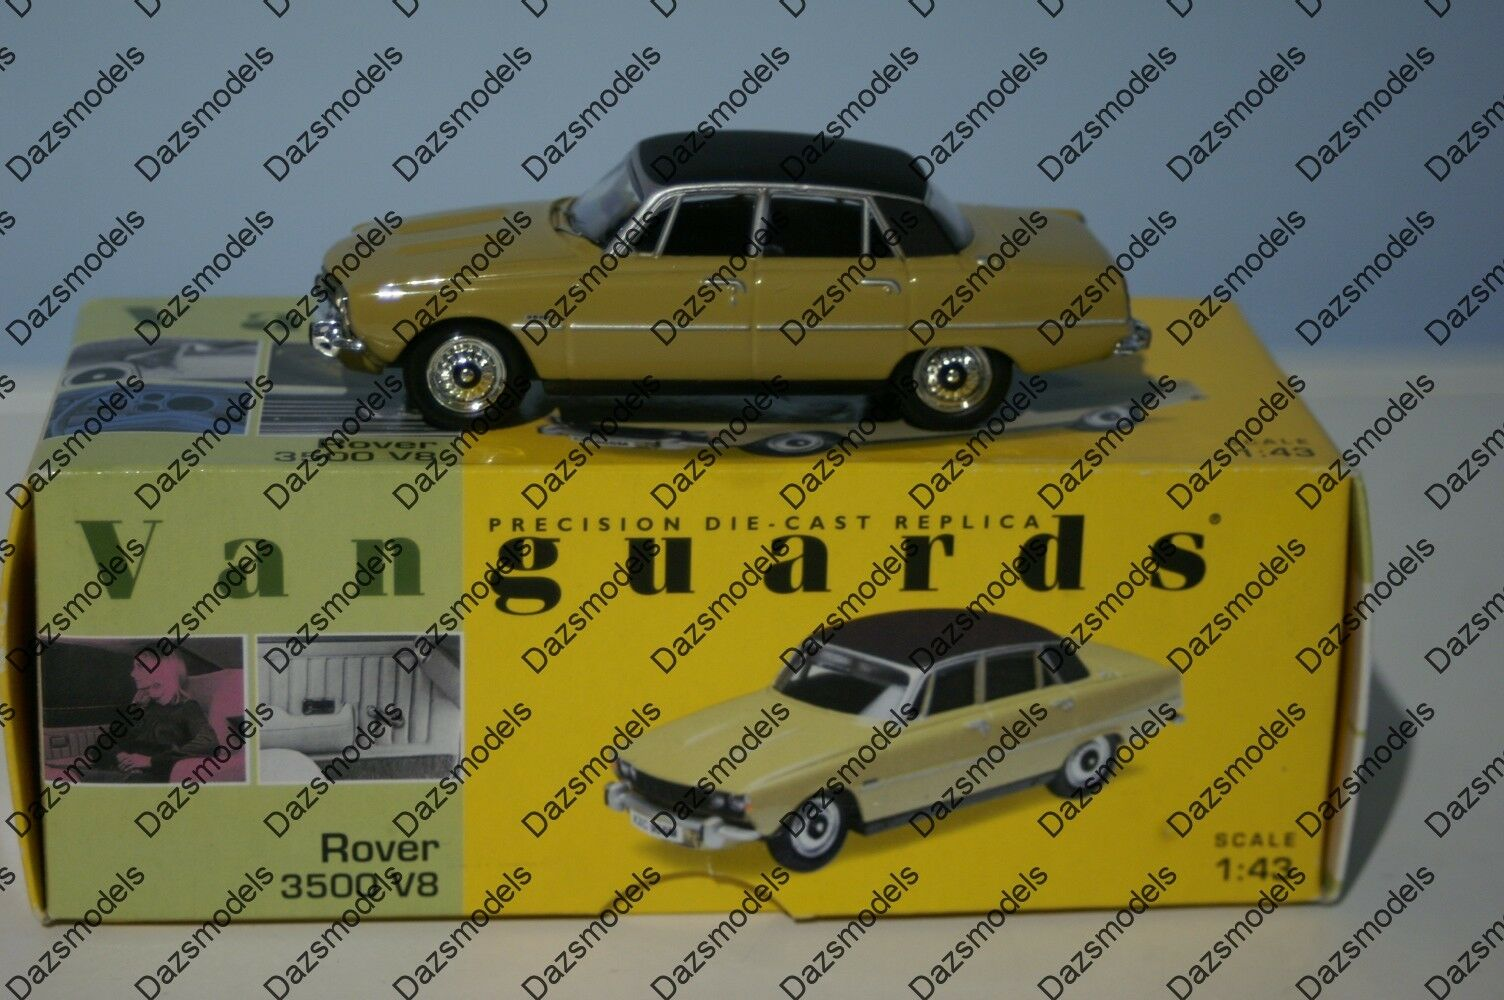 Vanguards Rover 3500 V8 Almond Almond Almond VA06500 1 43 Scale 430414